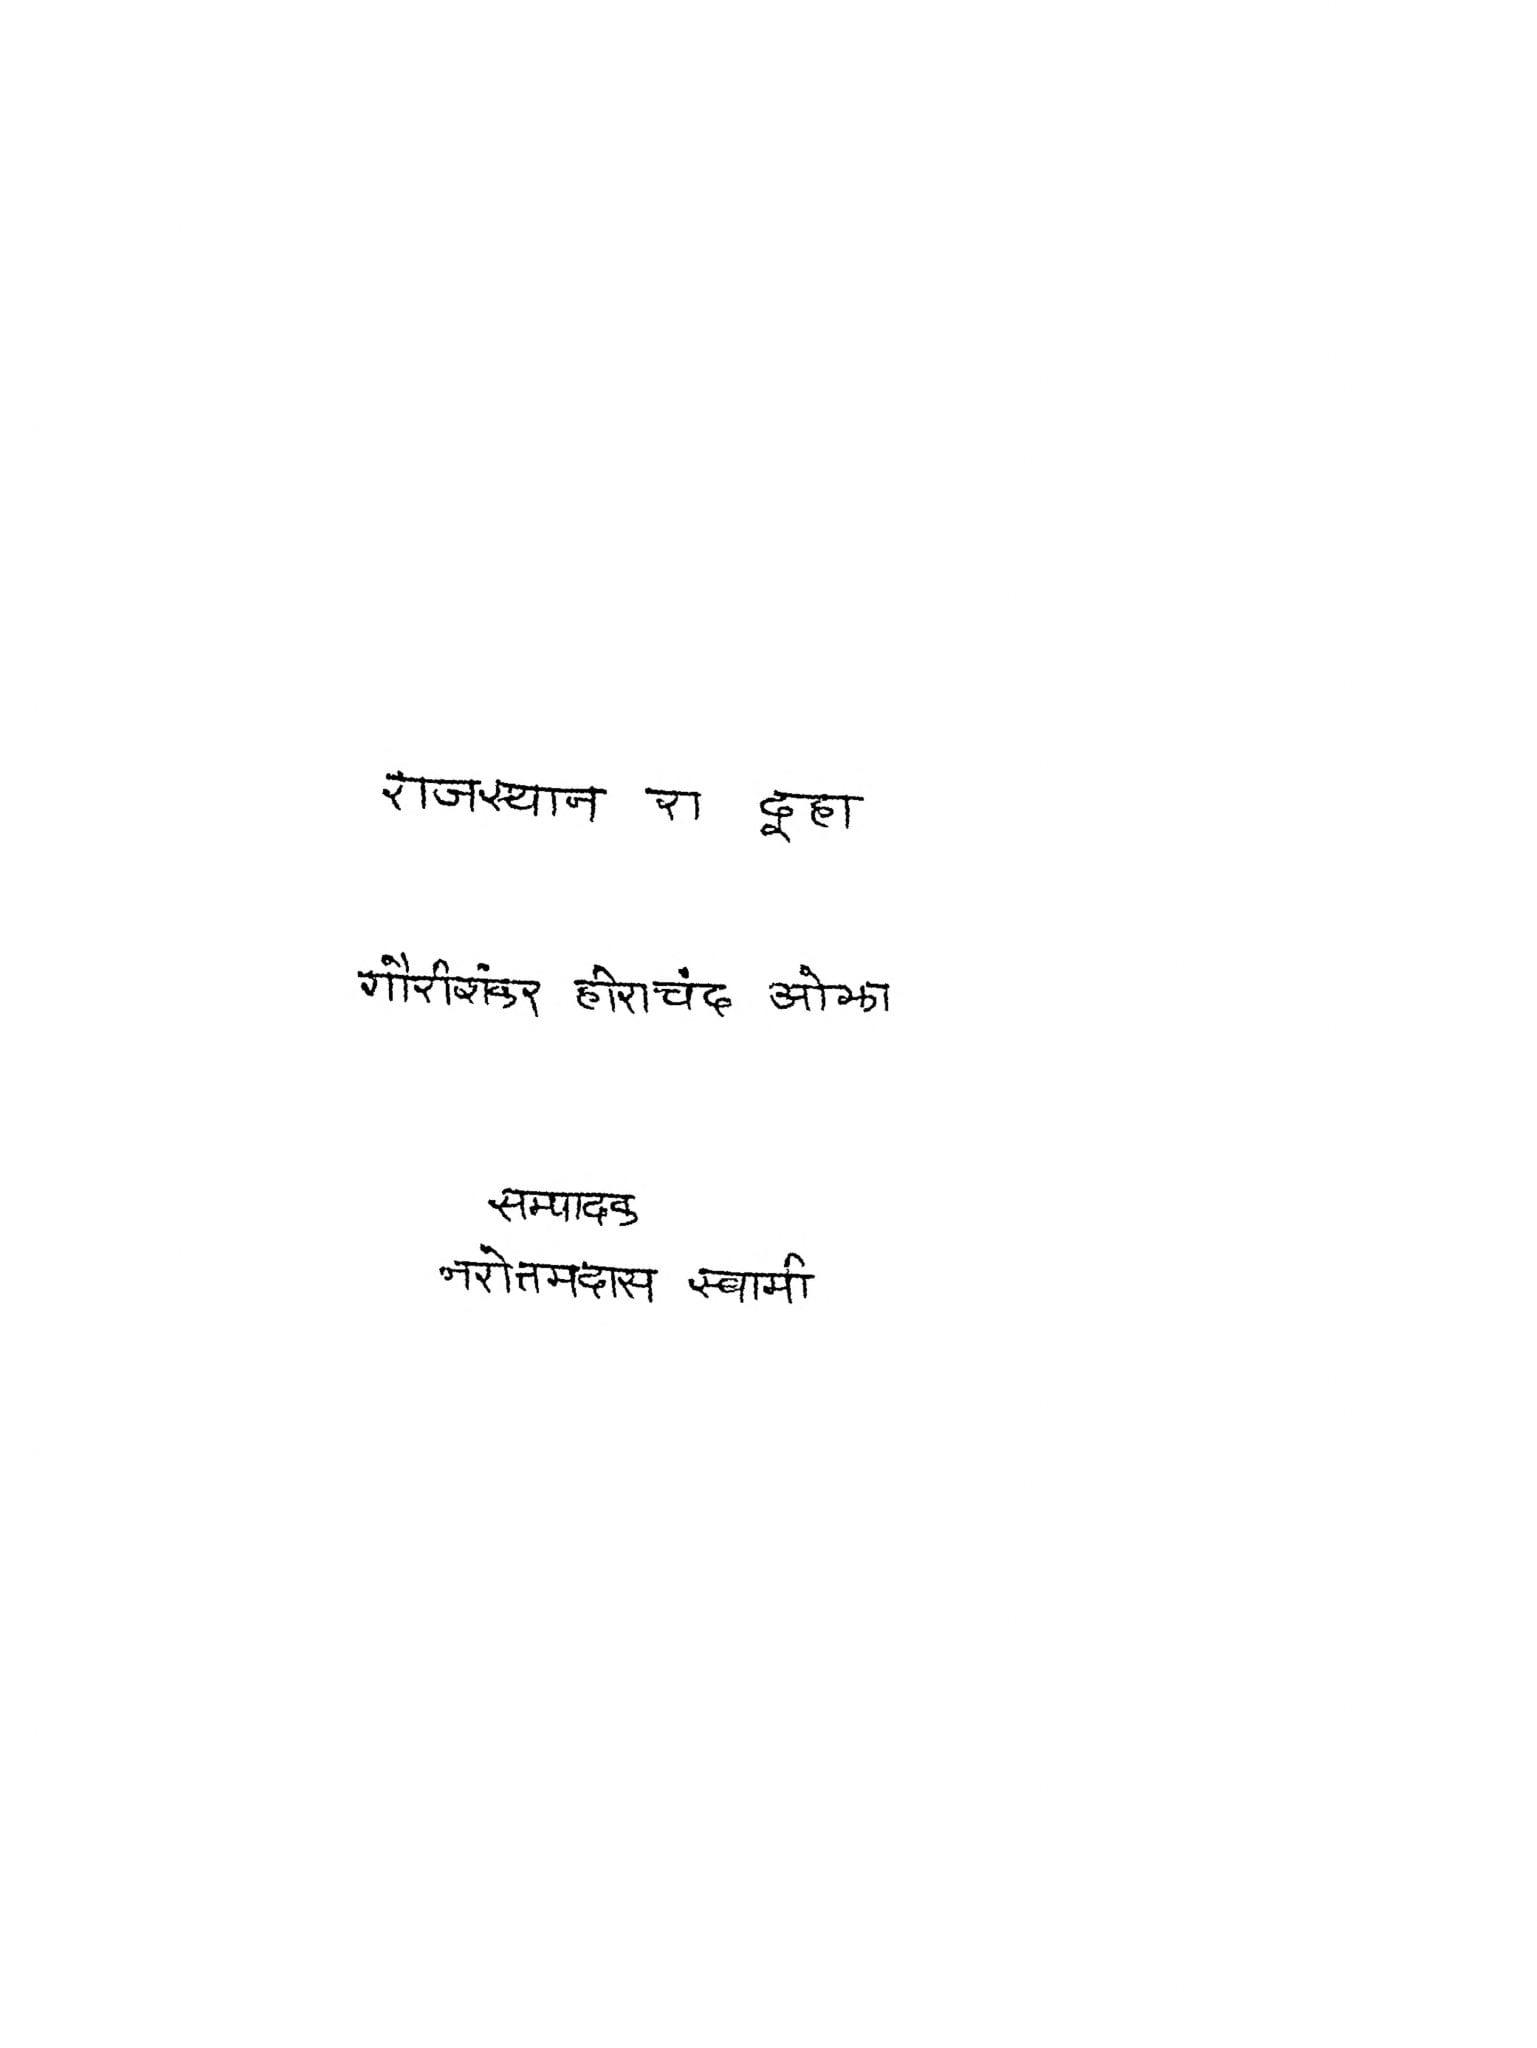 Rajasthan Ra Dooha Part - I by डॉ. गोरीशंकर हीराचन्द ओझा : Dr. Gaurishankar Heerachand Ojhaनरोत्तमदास - Narottam Das